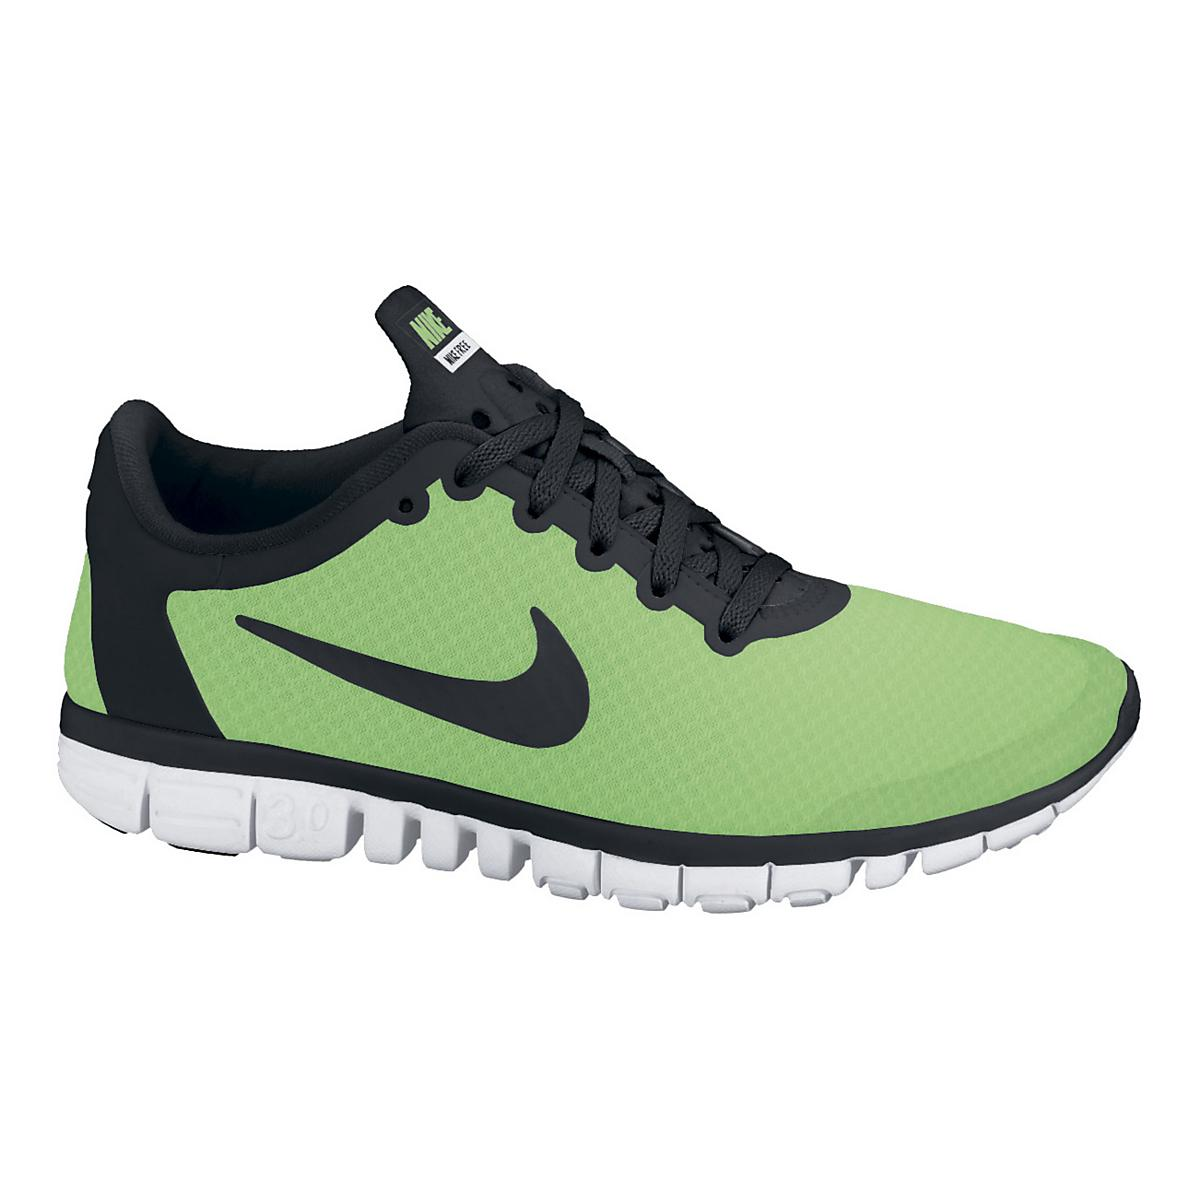 28ed5a24919 Su15 W Nike Free 3 ... Mens Nike Free 3.0 V2 Running Shoe at Road Runner  Sports ...